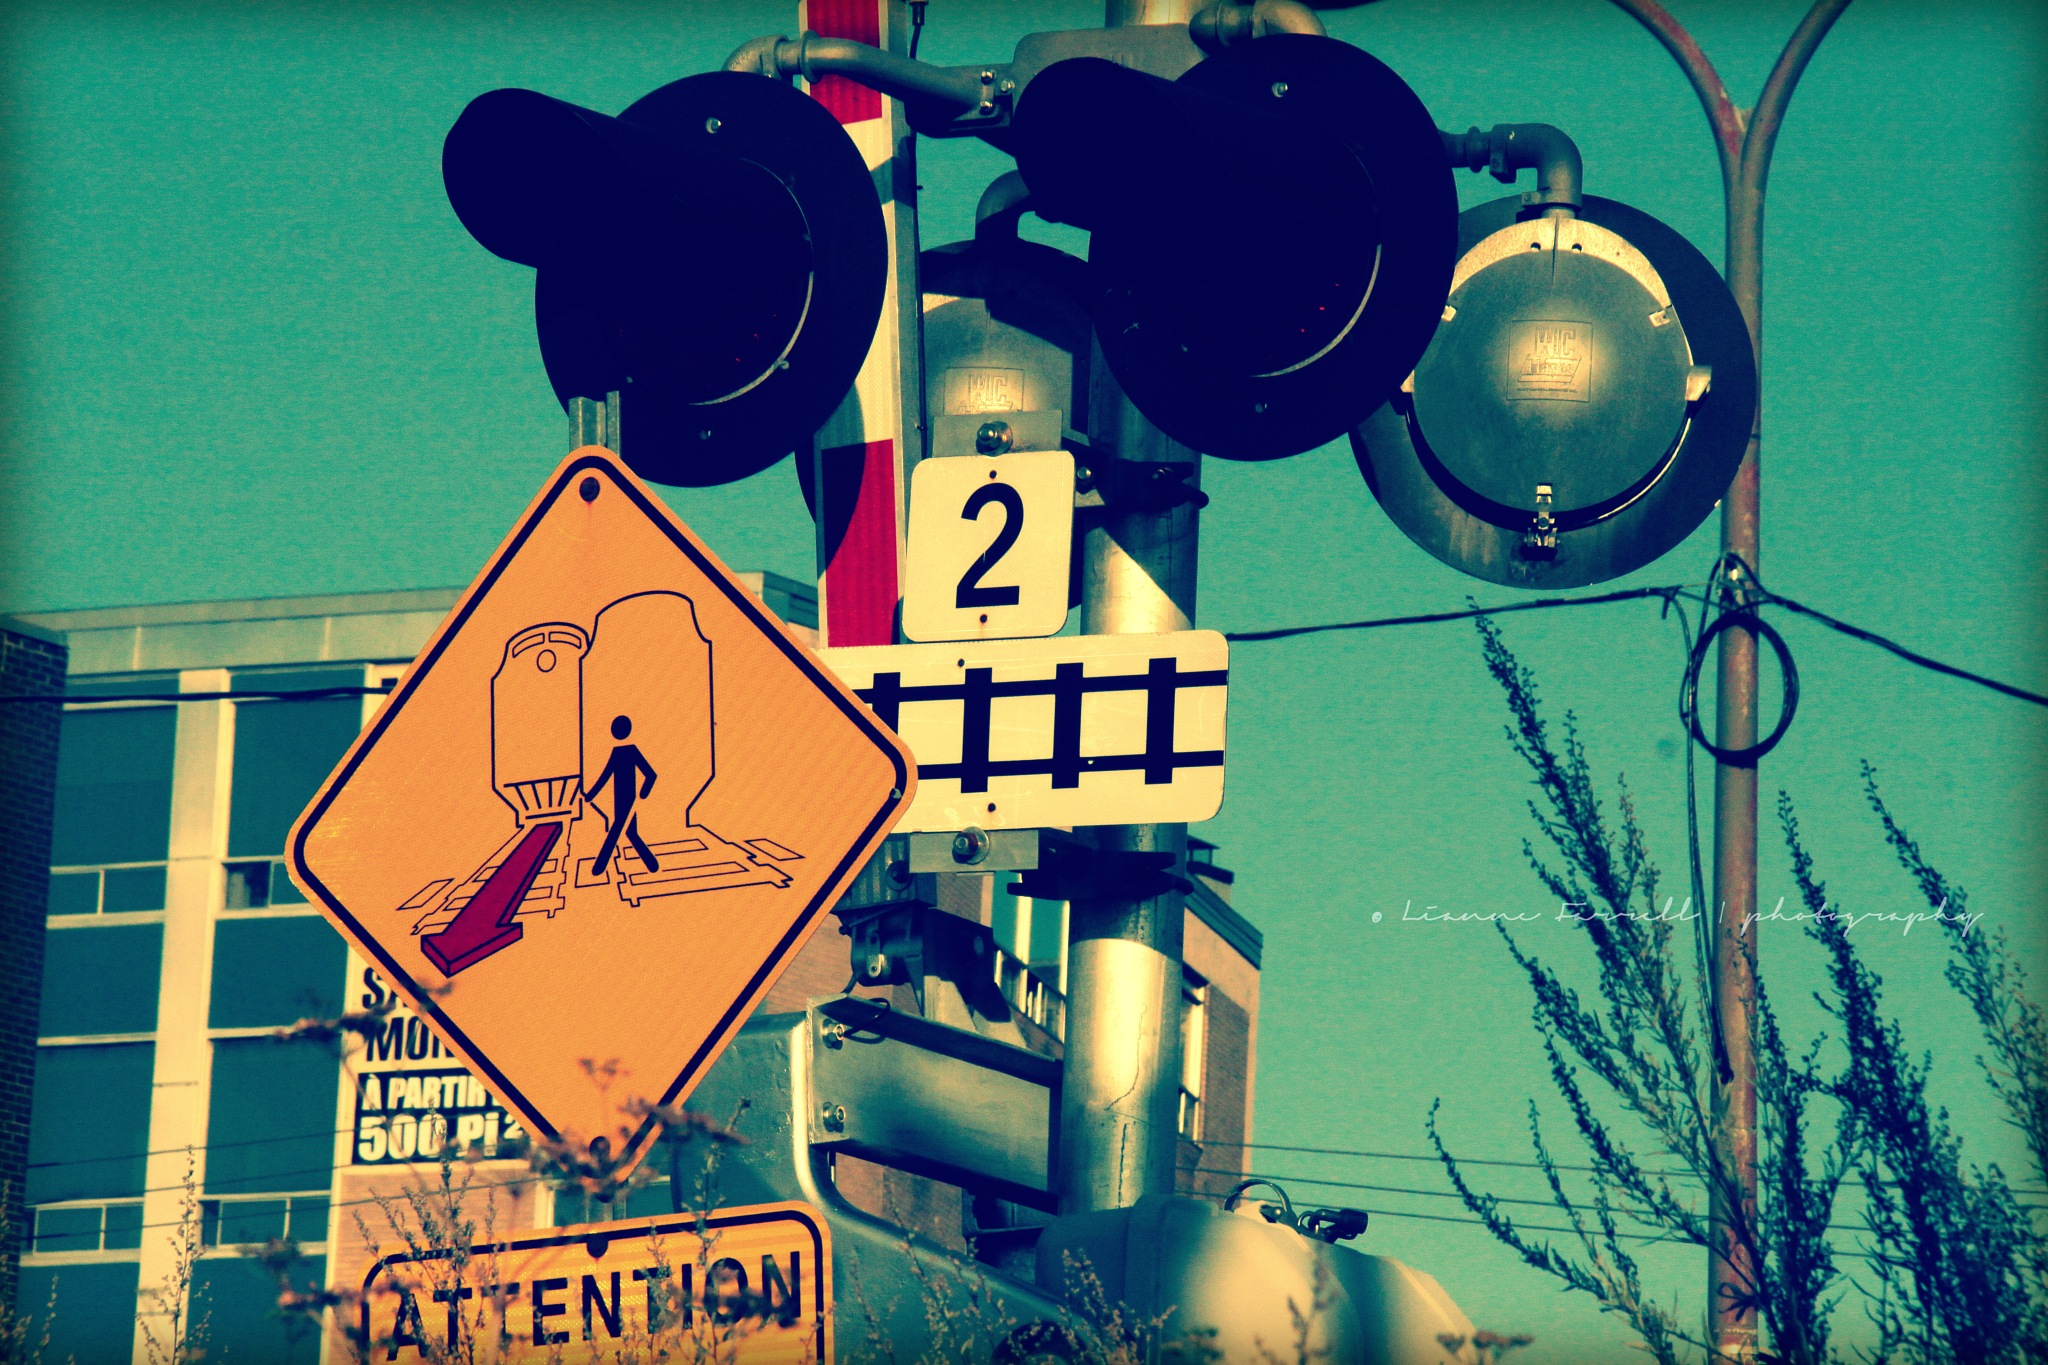 ATTENTION! Bruno Mars Crossing by candid'Li